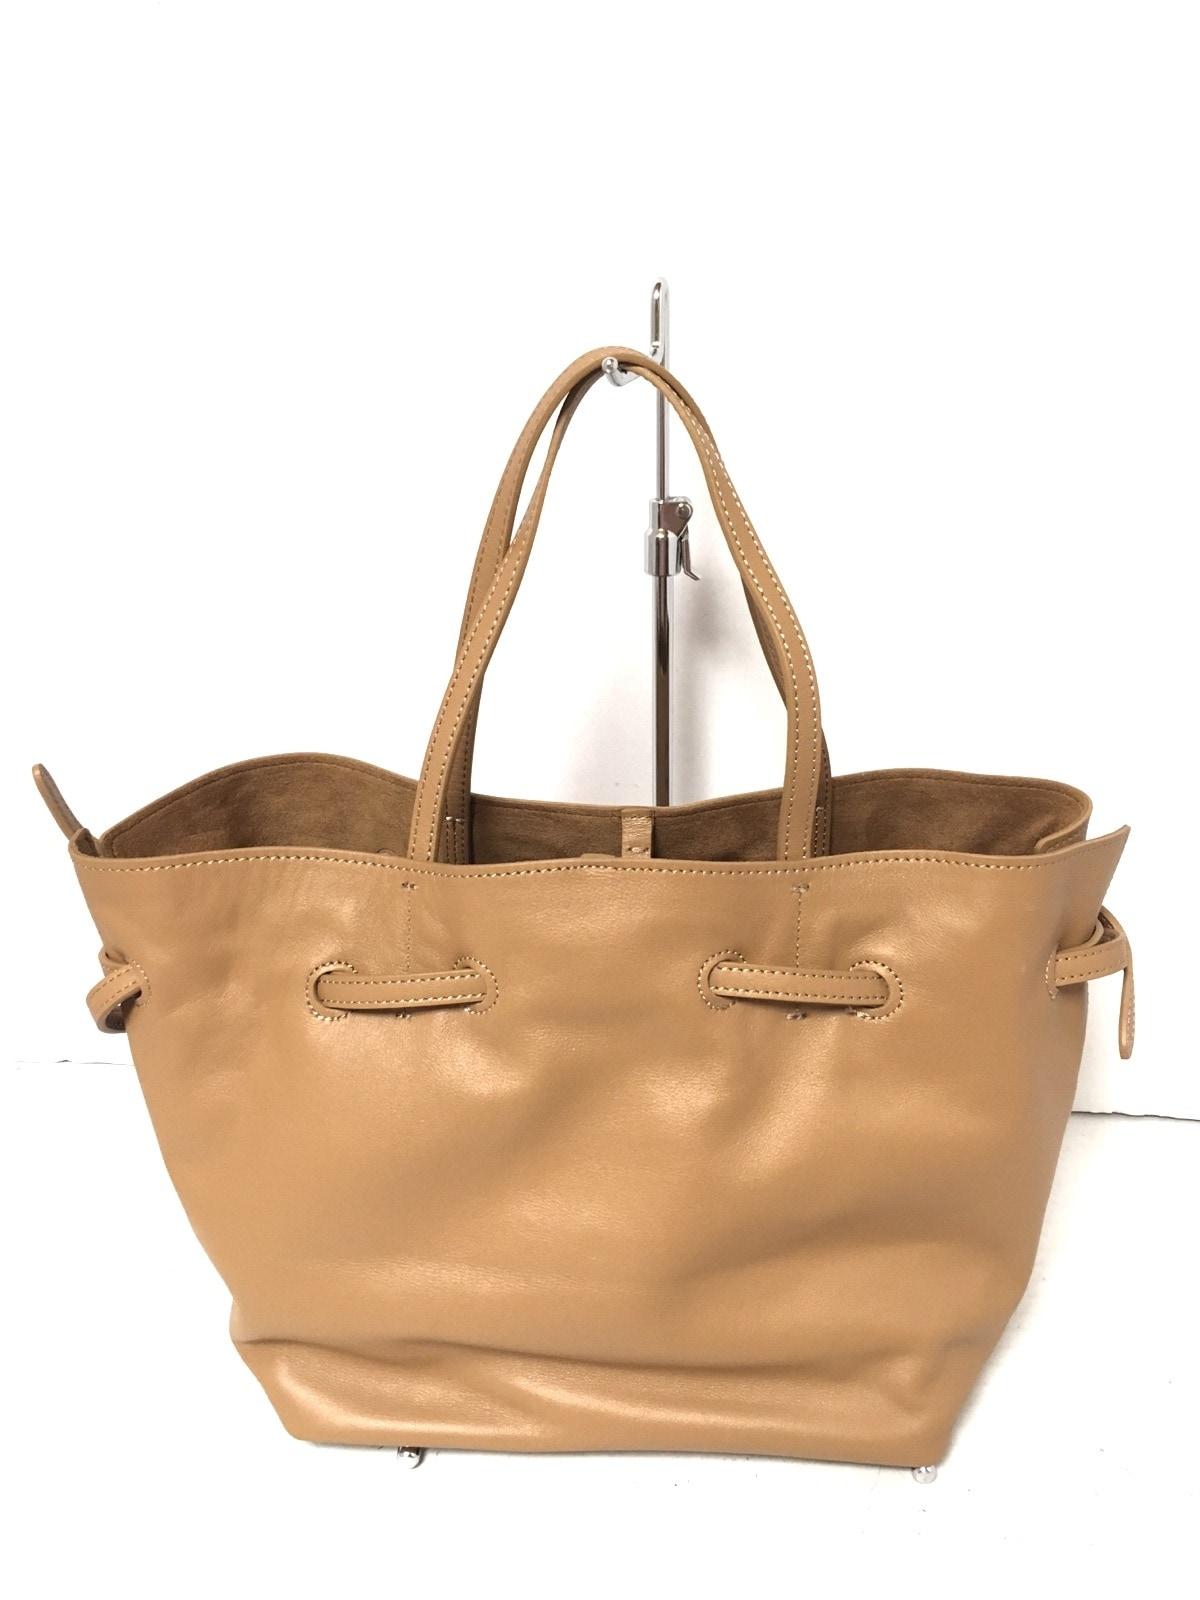 MARY AL TERNA(メアリオルターナ)のトートバッグ